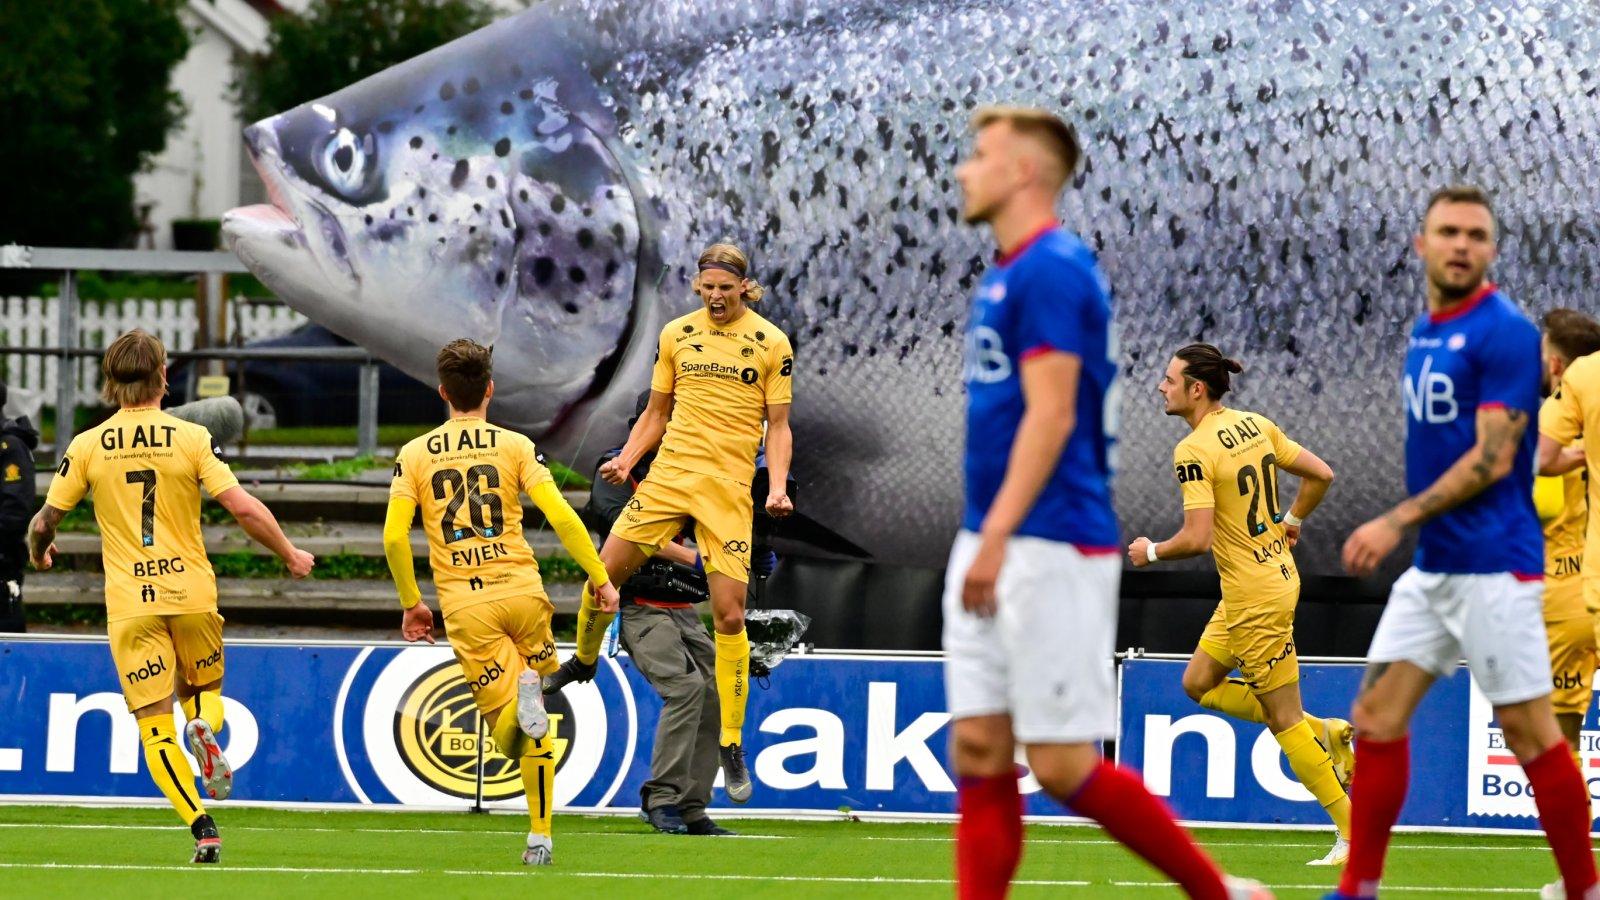 Ulrik Saltnes scoret mål mot Vålerenga på hjemmebane i 2019 under laksekampen.